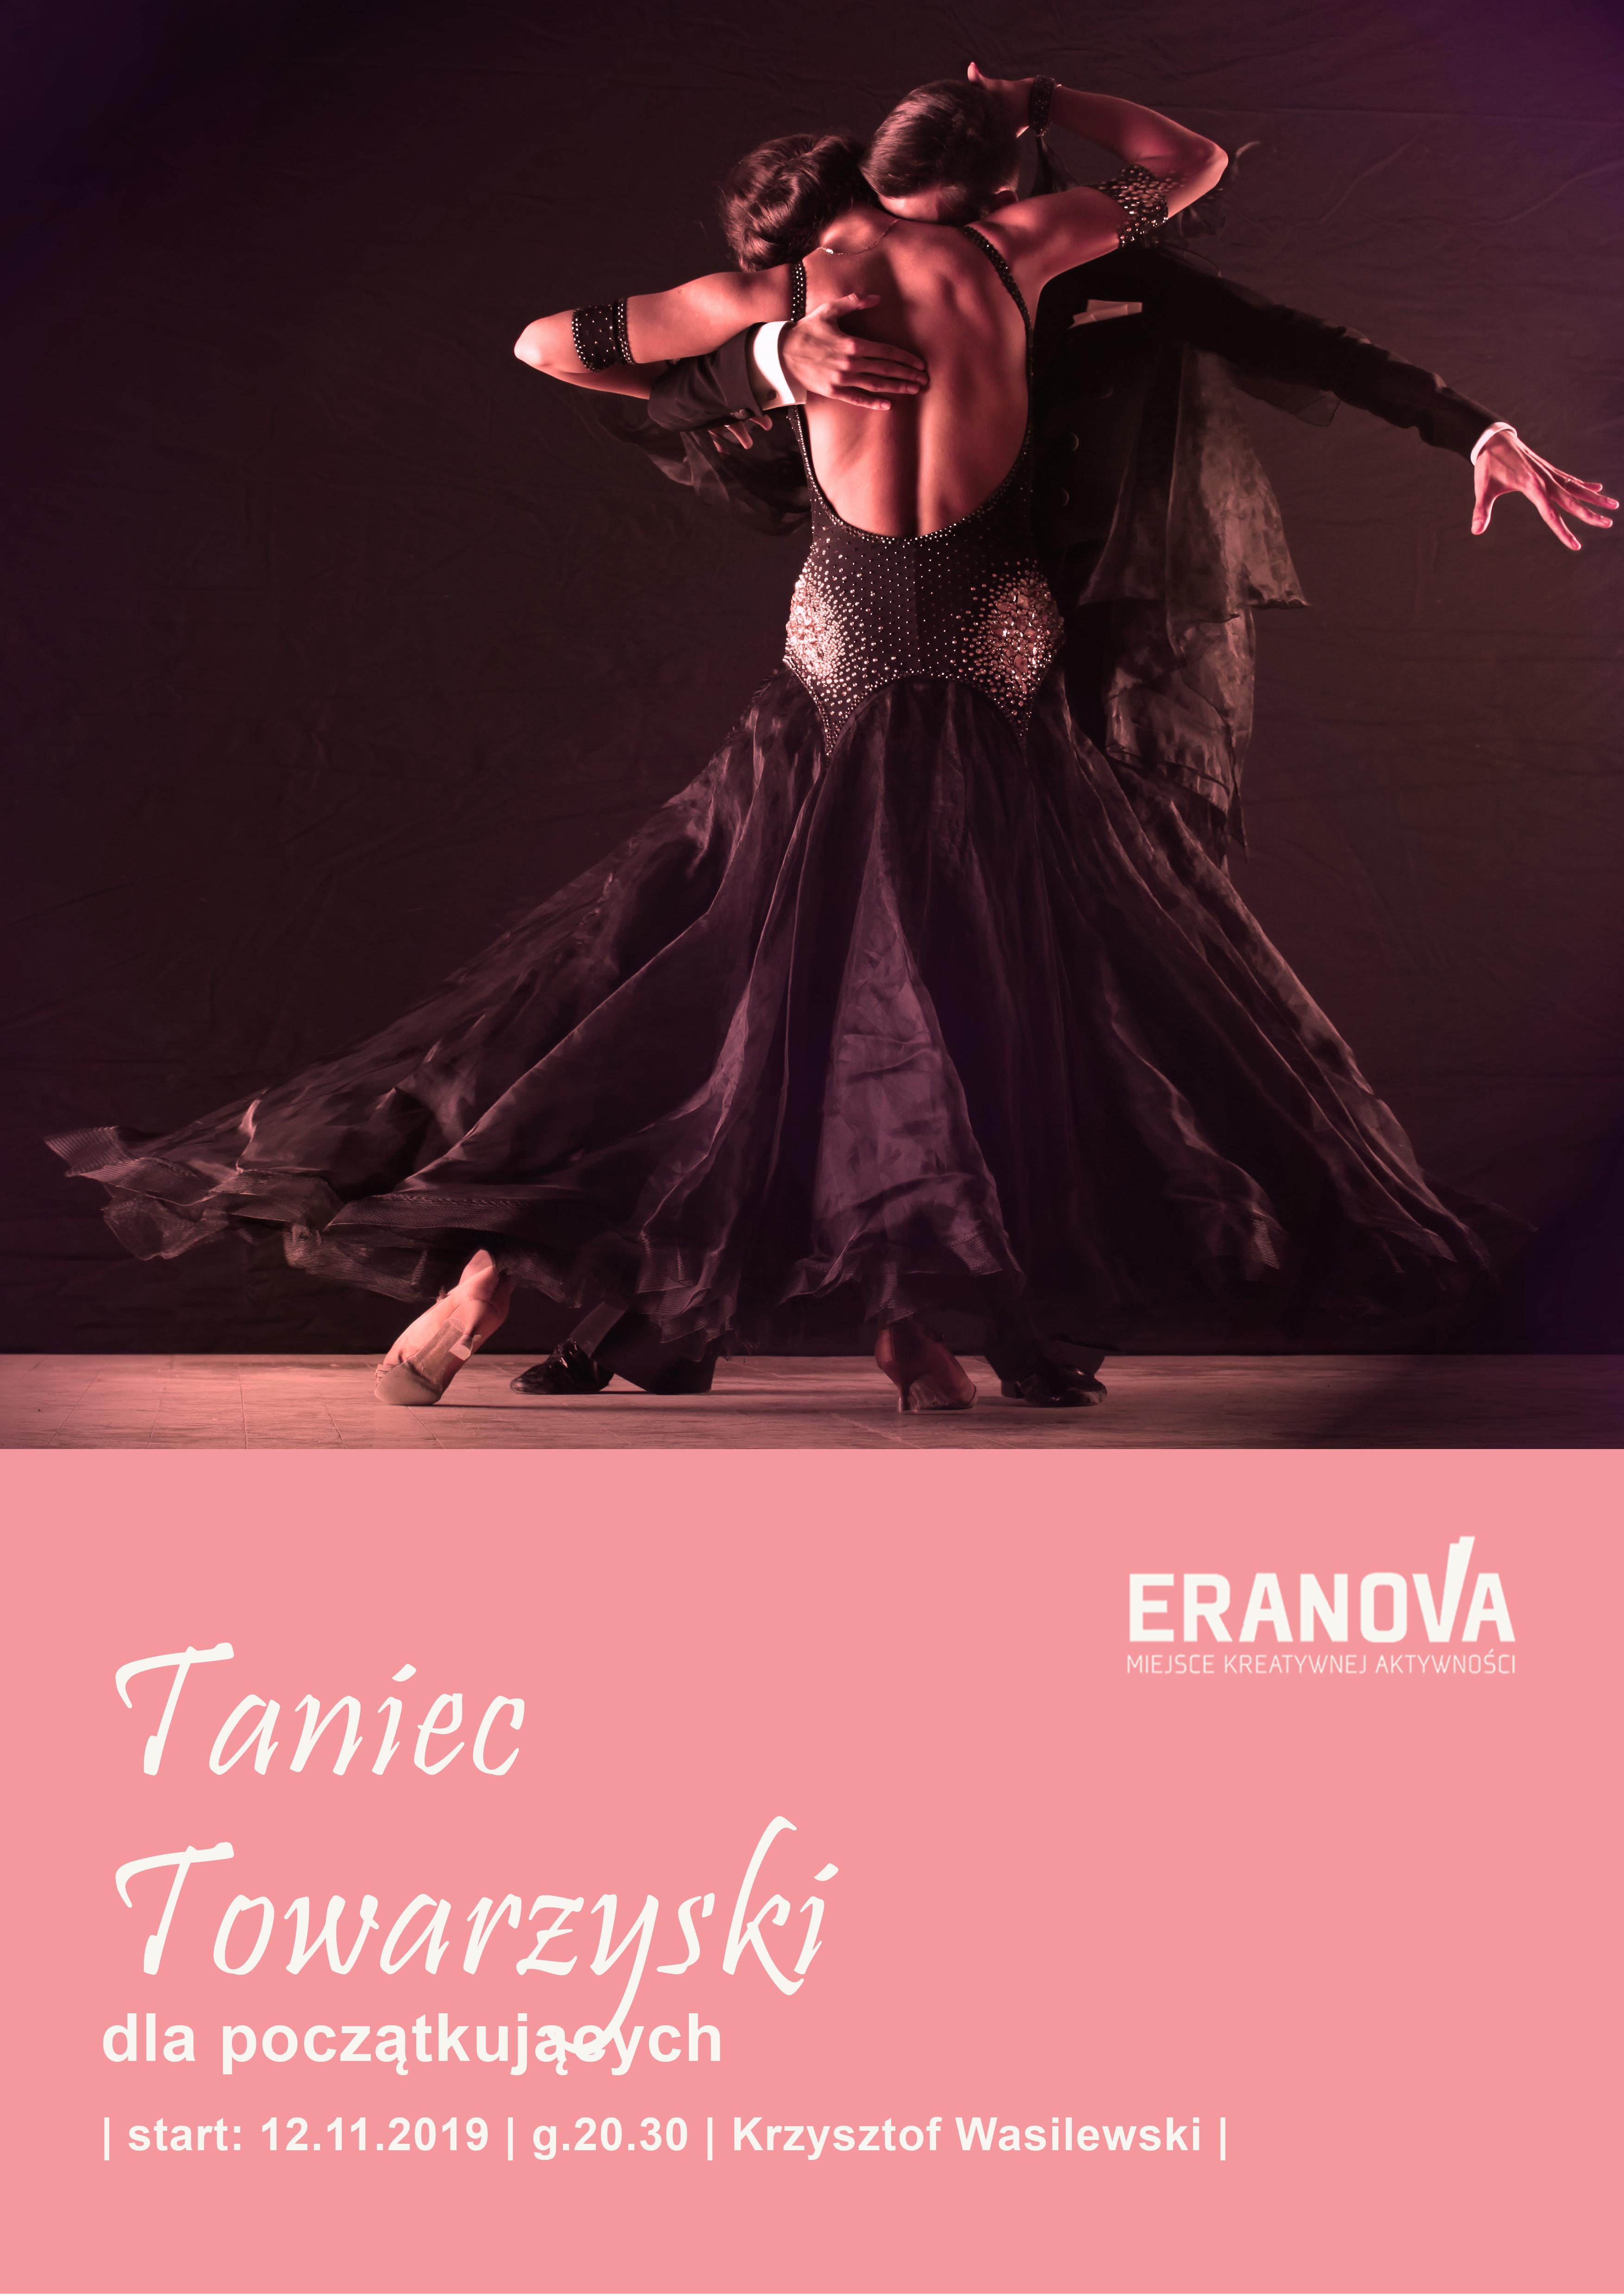 http://m.eranova.pl/2019/10/orig/taniec-towarzyski-3116.jpg